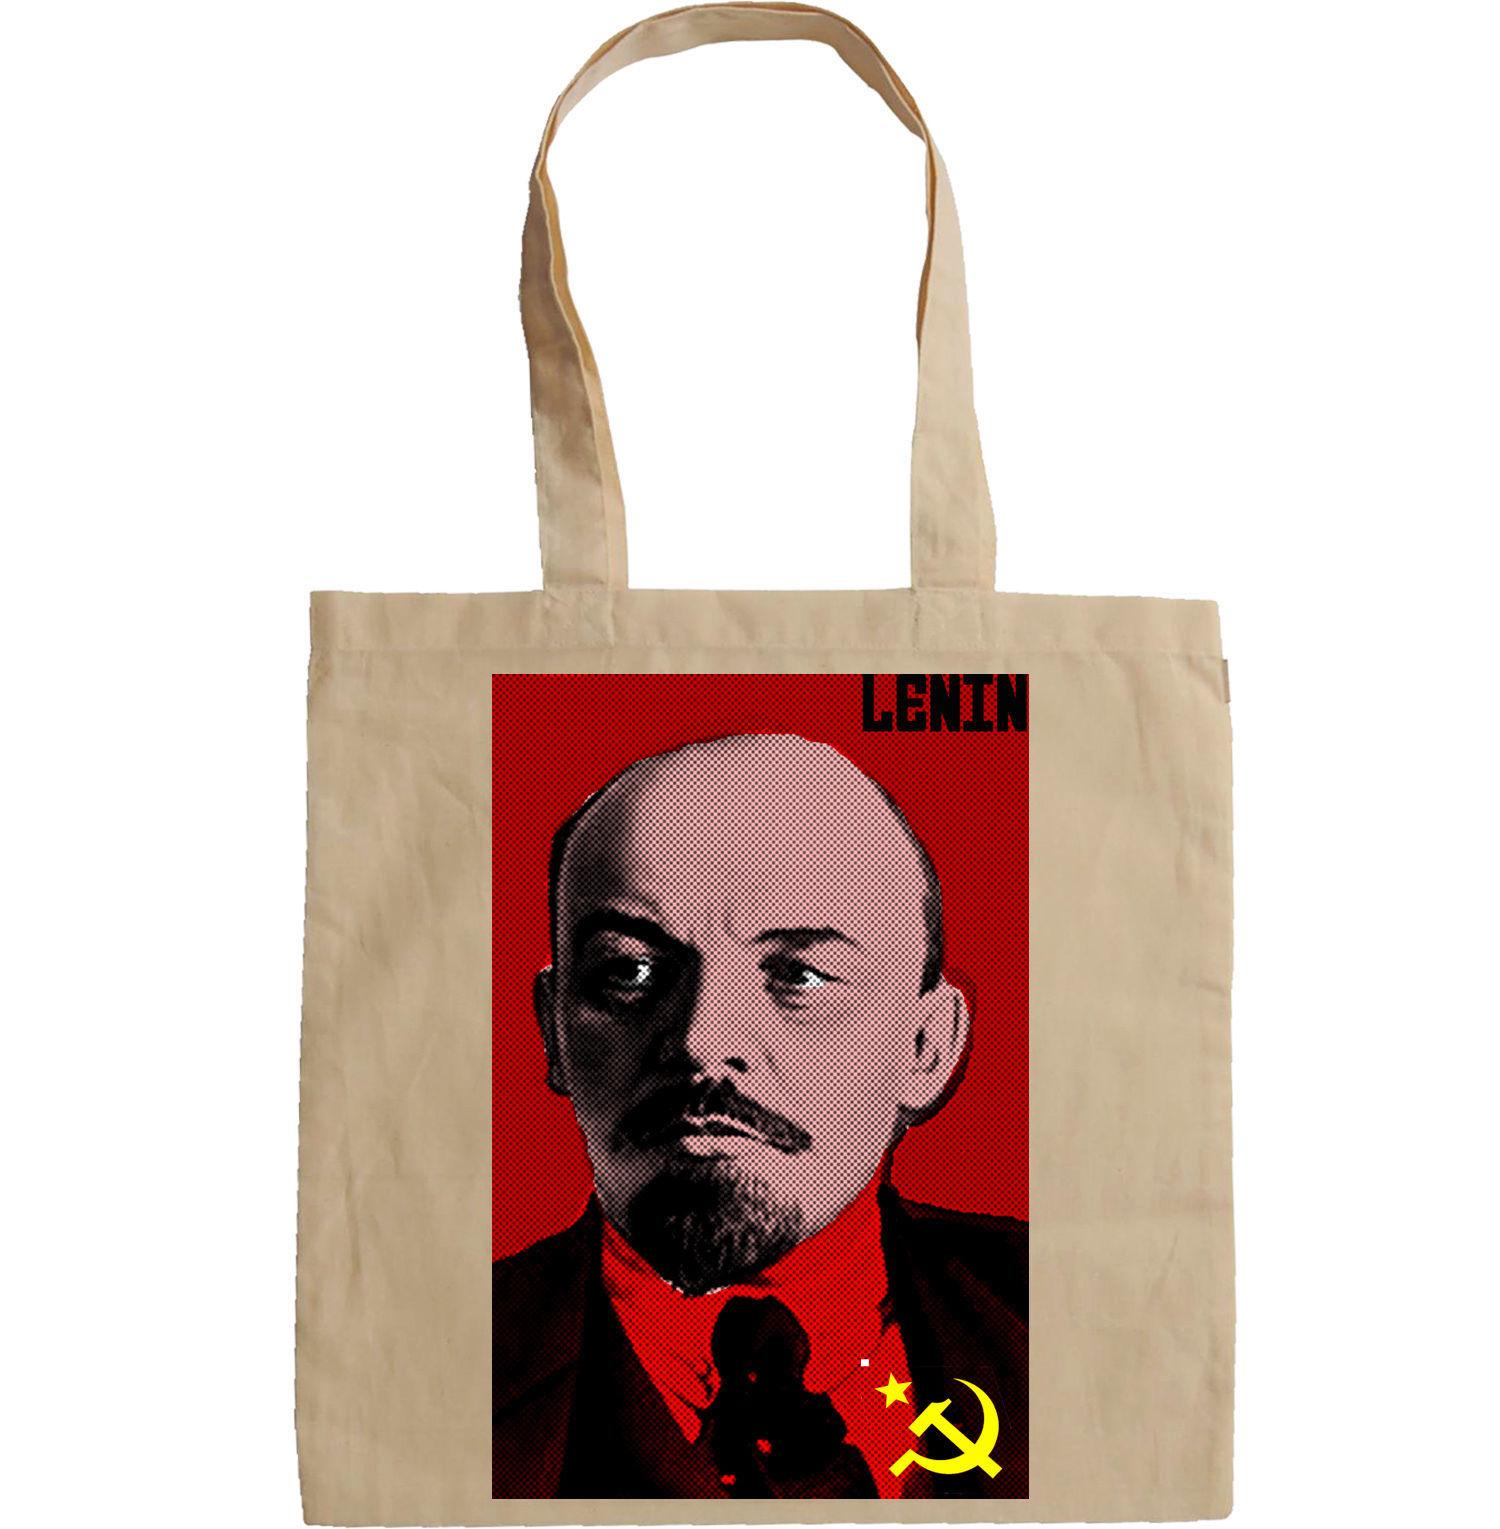 LENIN SOVIET UNION LEADER - NEW AMAZING GRAPHIC HAND BAG/TOTE BAG